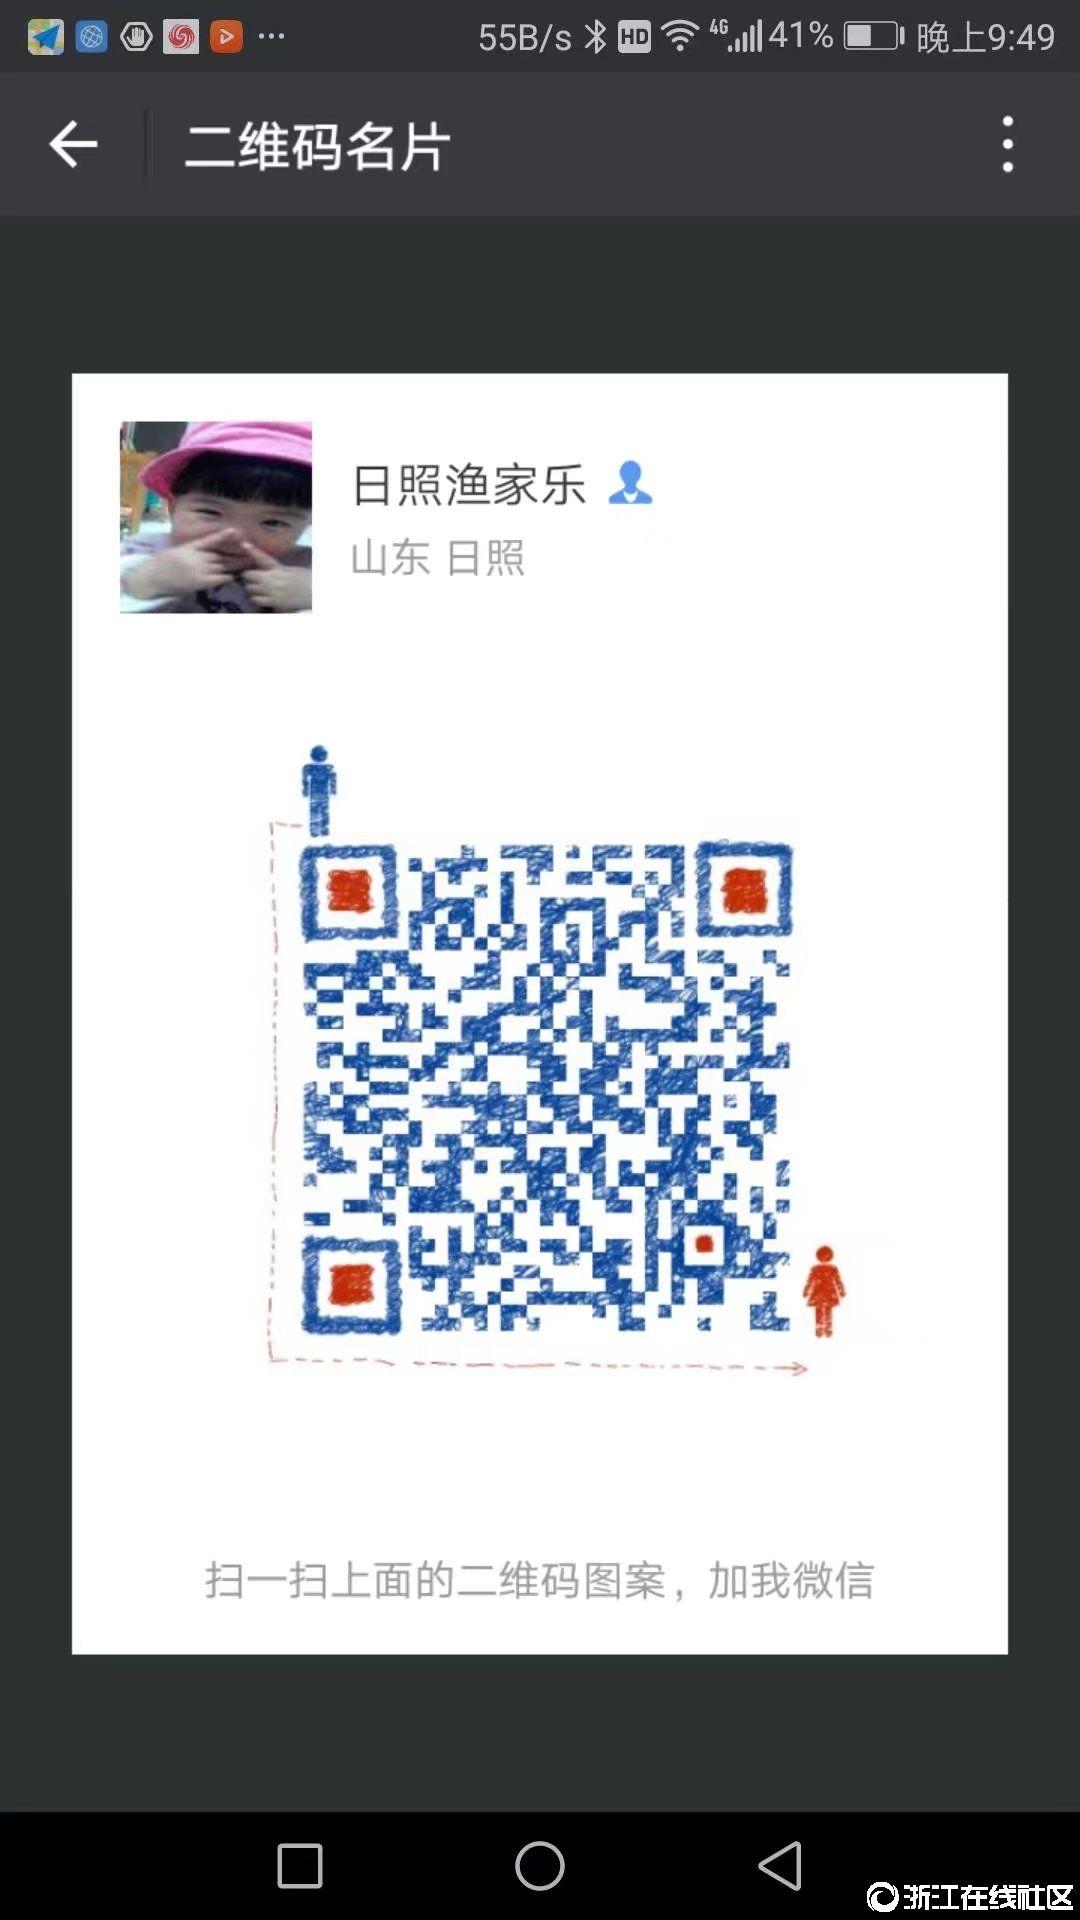 183912zoq4349kcqpqvkxy.jpg